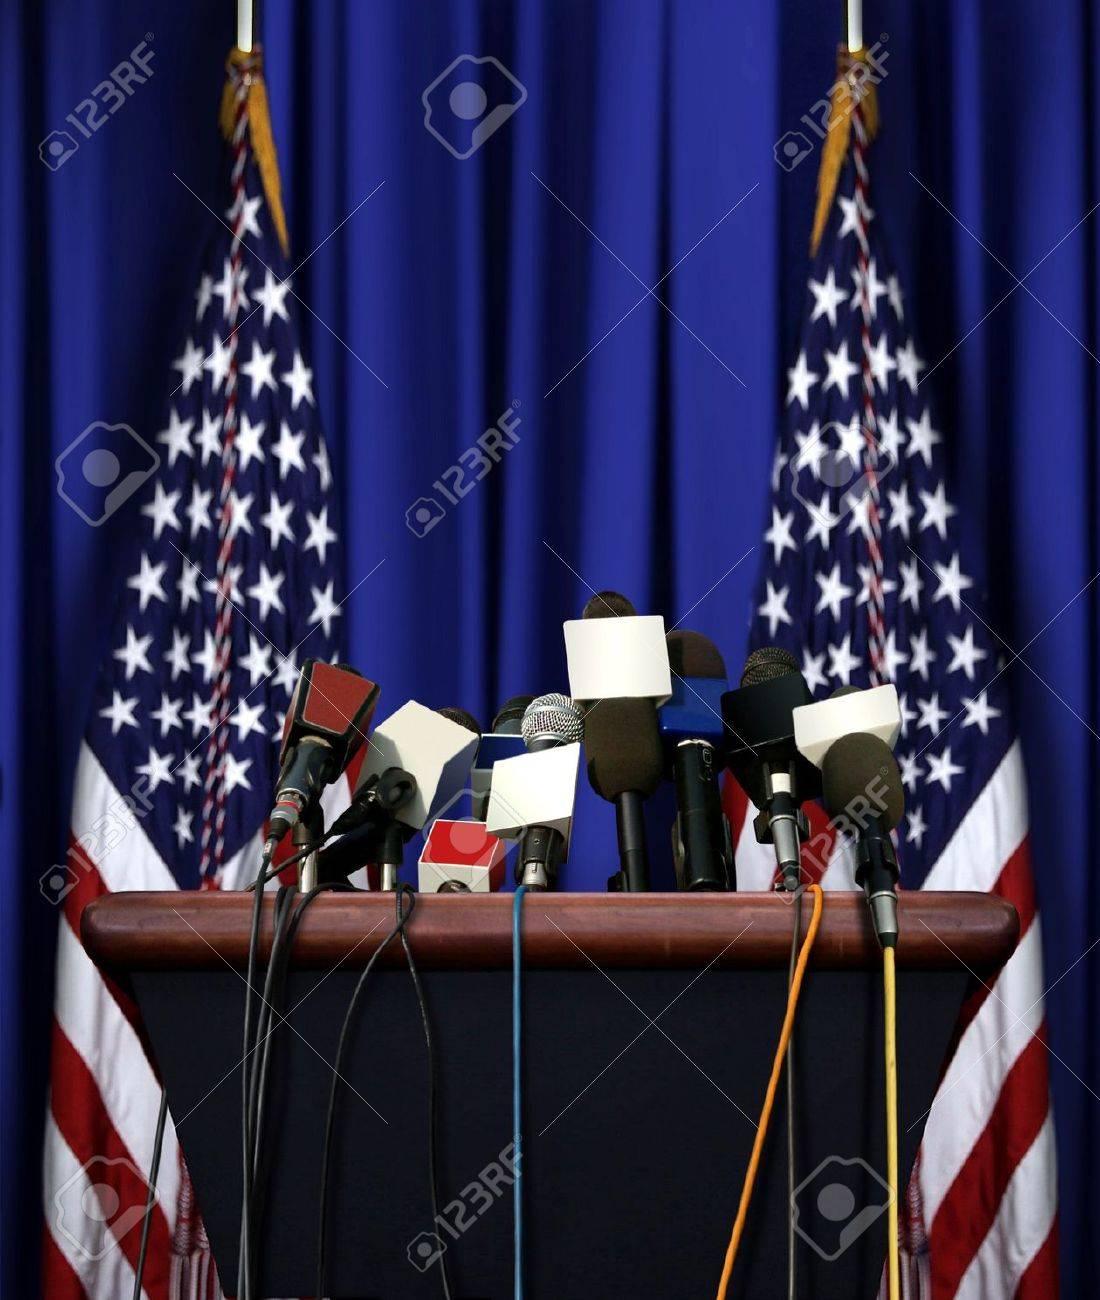 President Speech Podium - 30830537